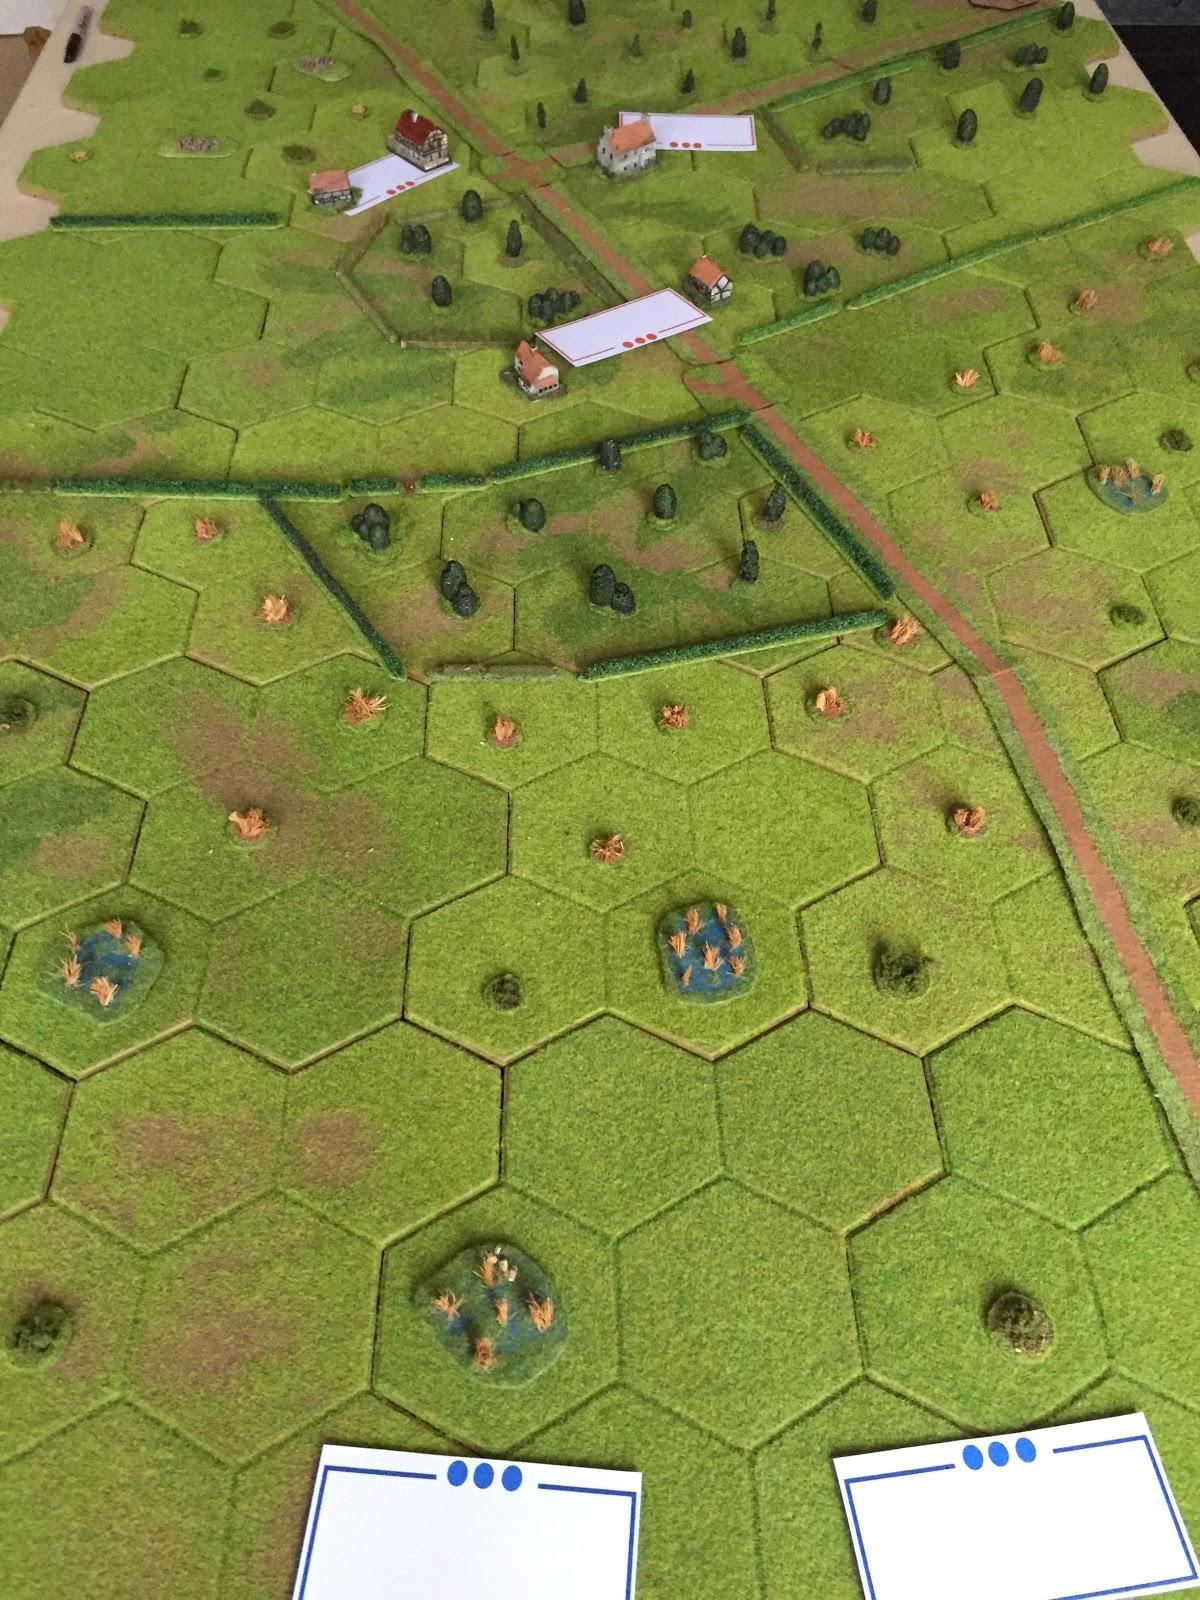 Long shot: British at bottom, Germans in village at top